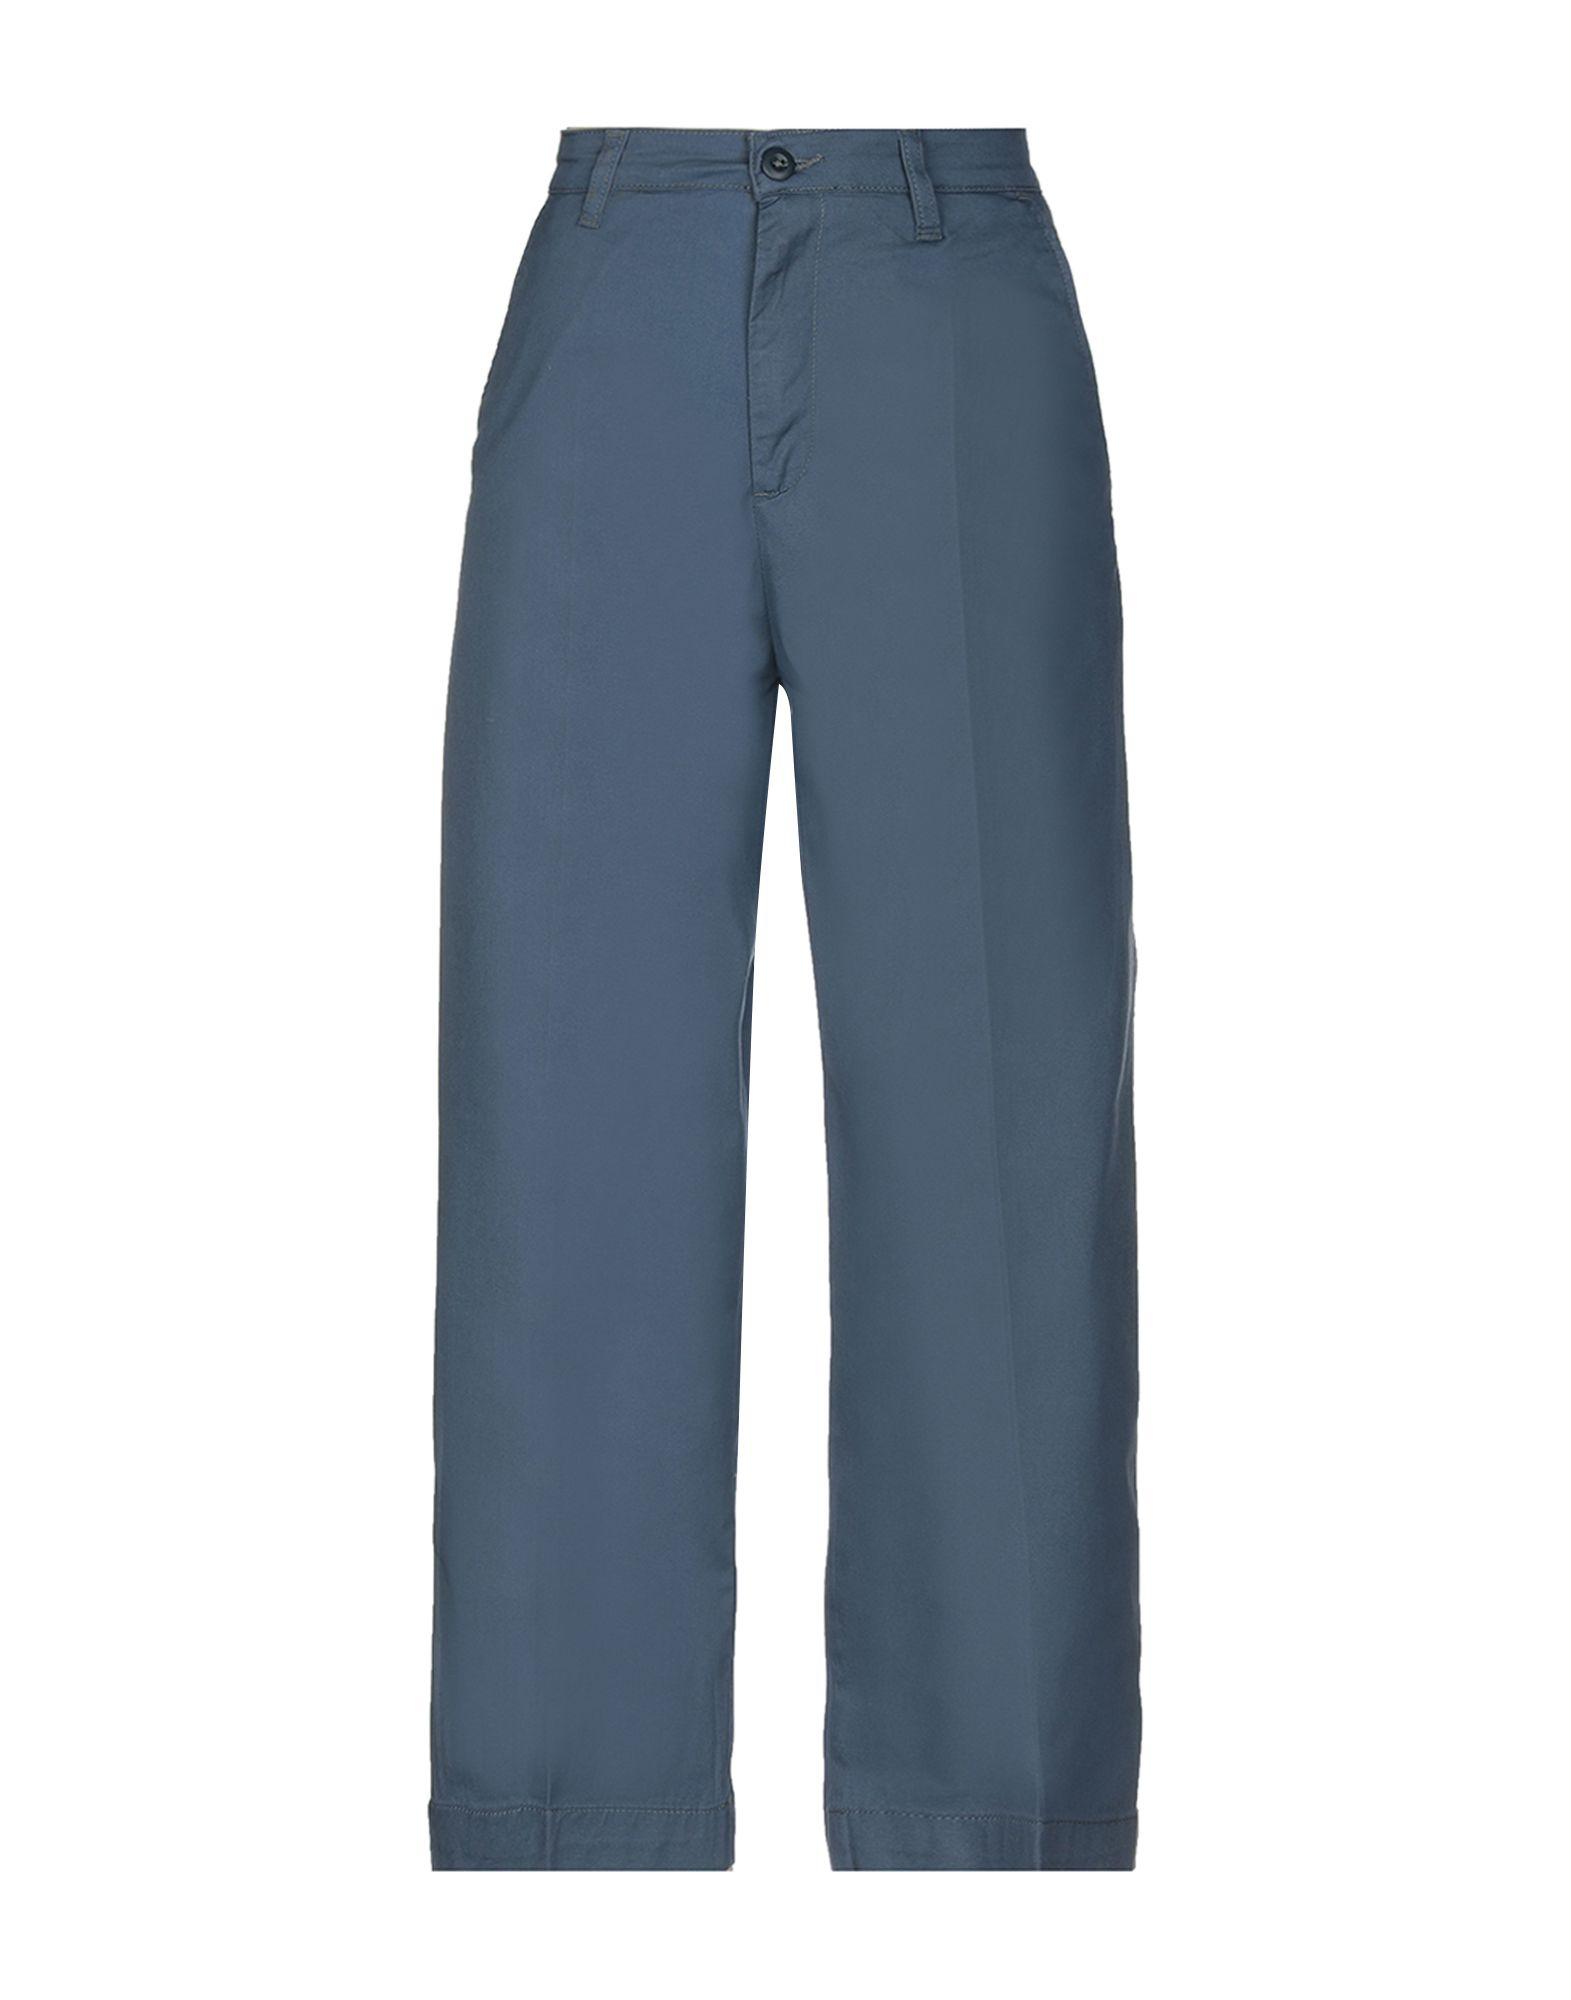 CARHARTT Повседневные брюки брюки чинос quelle quelle 920895